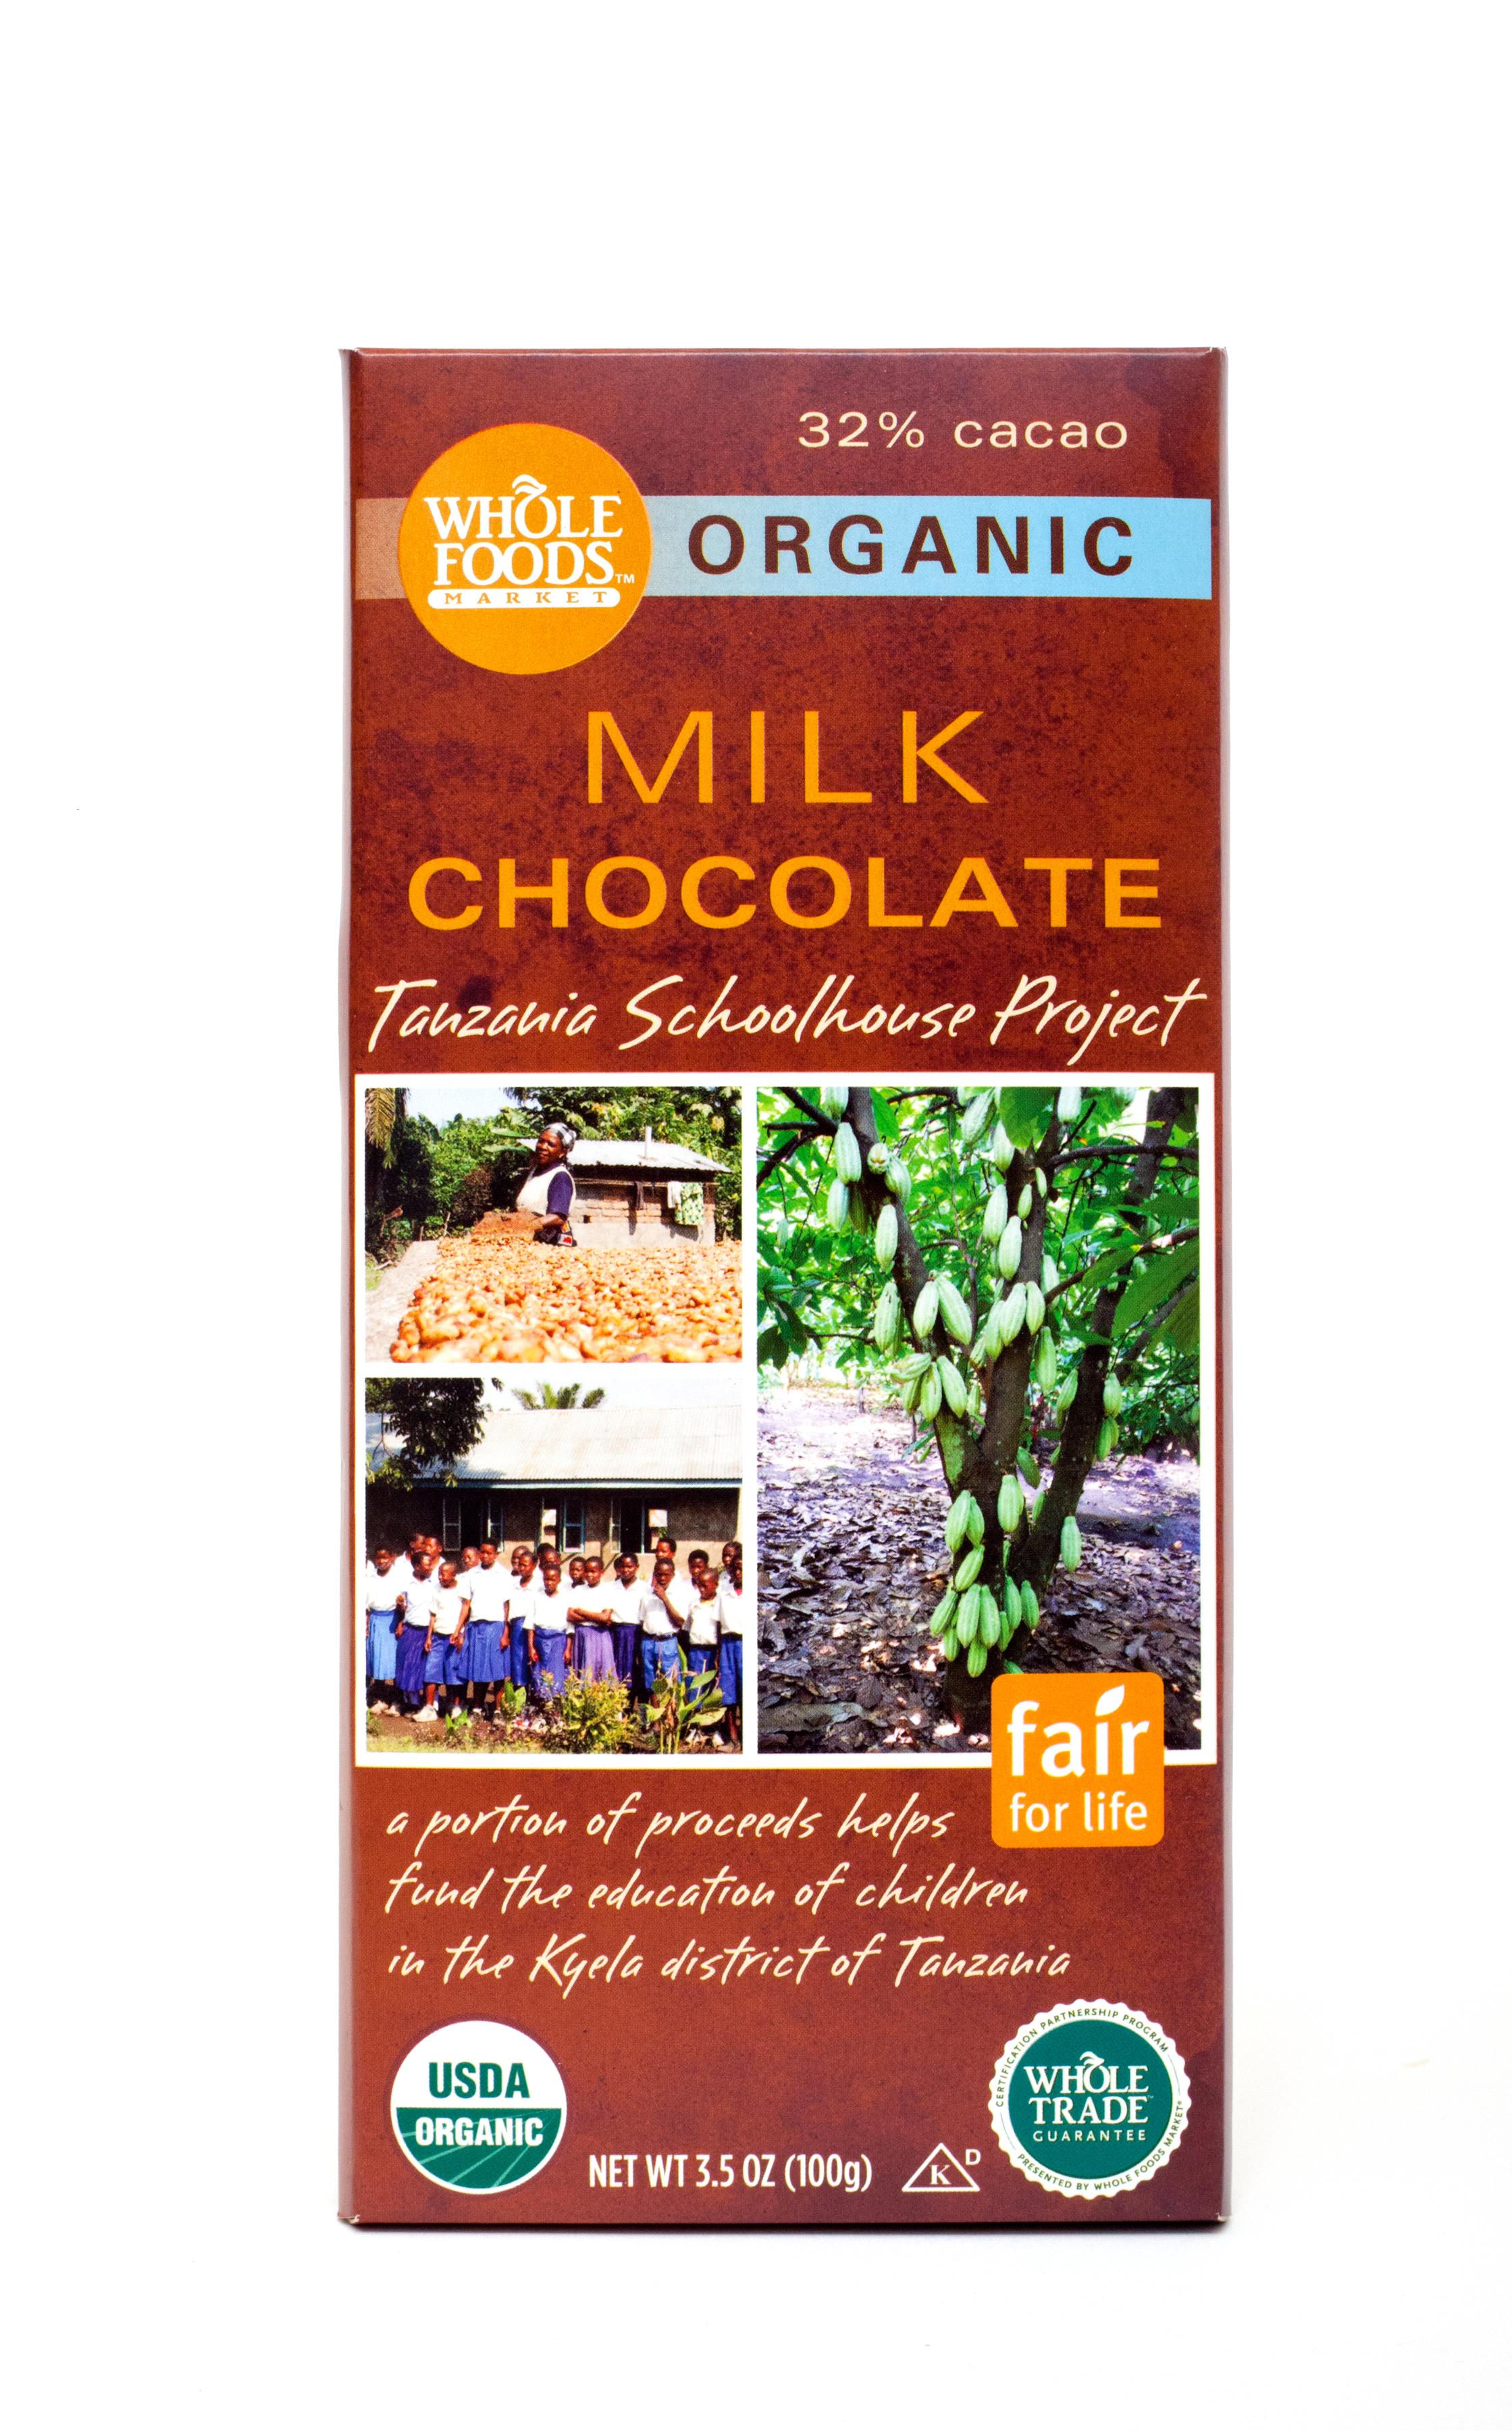 WFMO_Milk_Chocolate_Tanzania